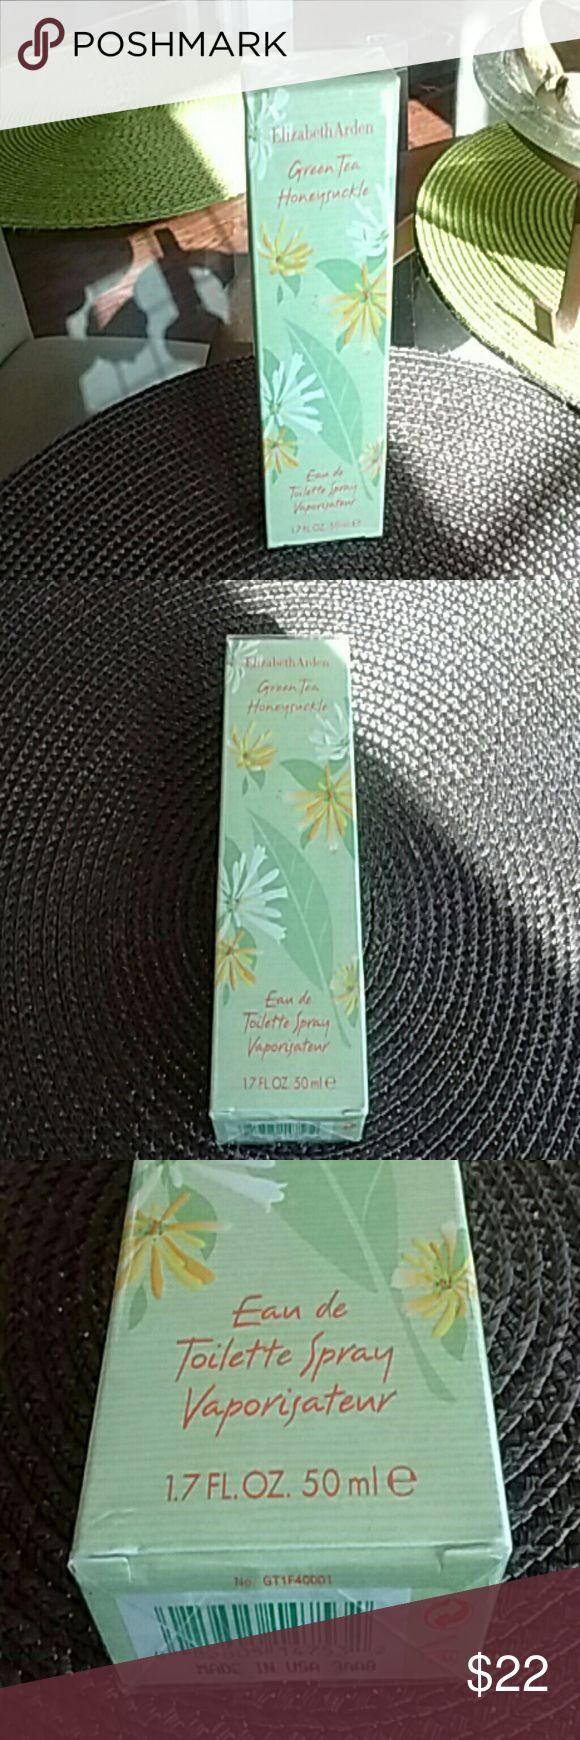 Green tea honeysuckle eau de toilette Spray. Never opened. 2015 Xmas gift. 1.7 FL oz Or 50ml. Elizabeth Arden Other